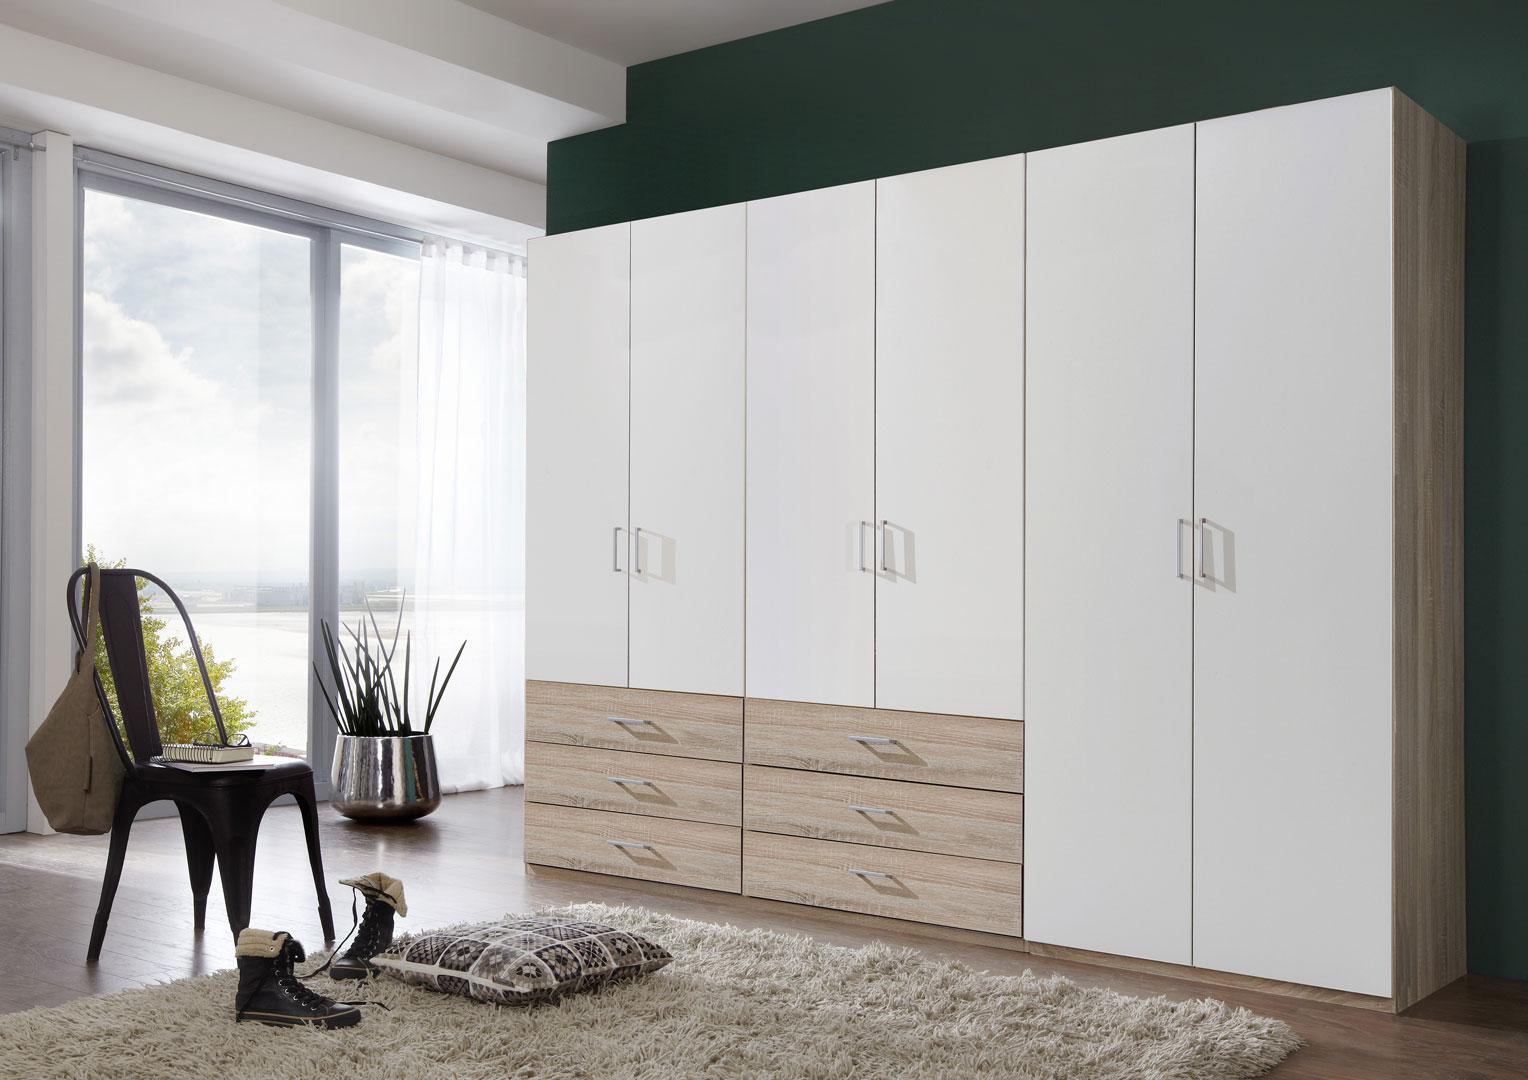 Armoire contemporaine 6 portes/6 tiroirs coloris blanc/chêne clair Simbad